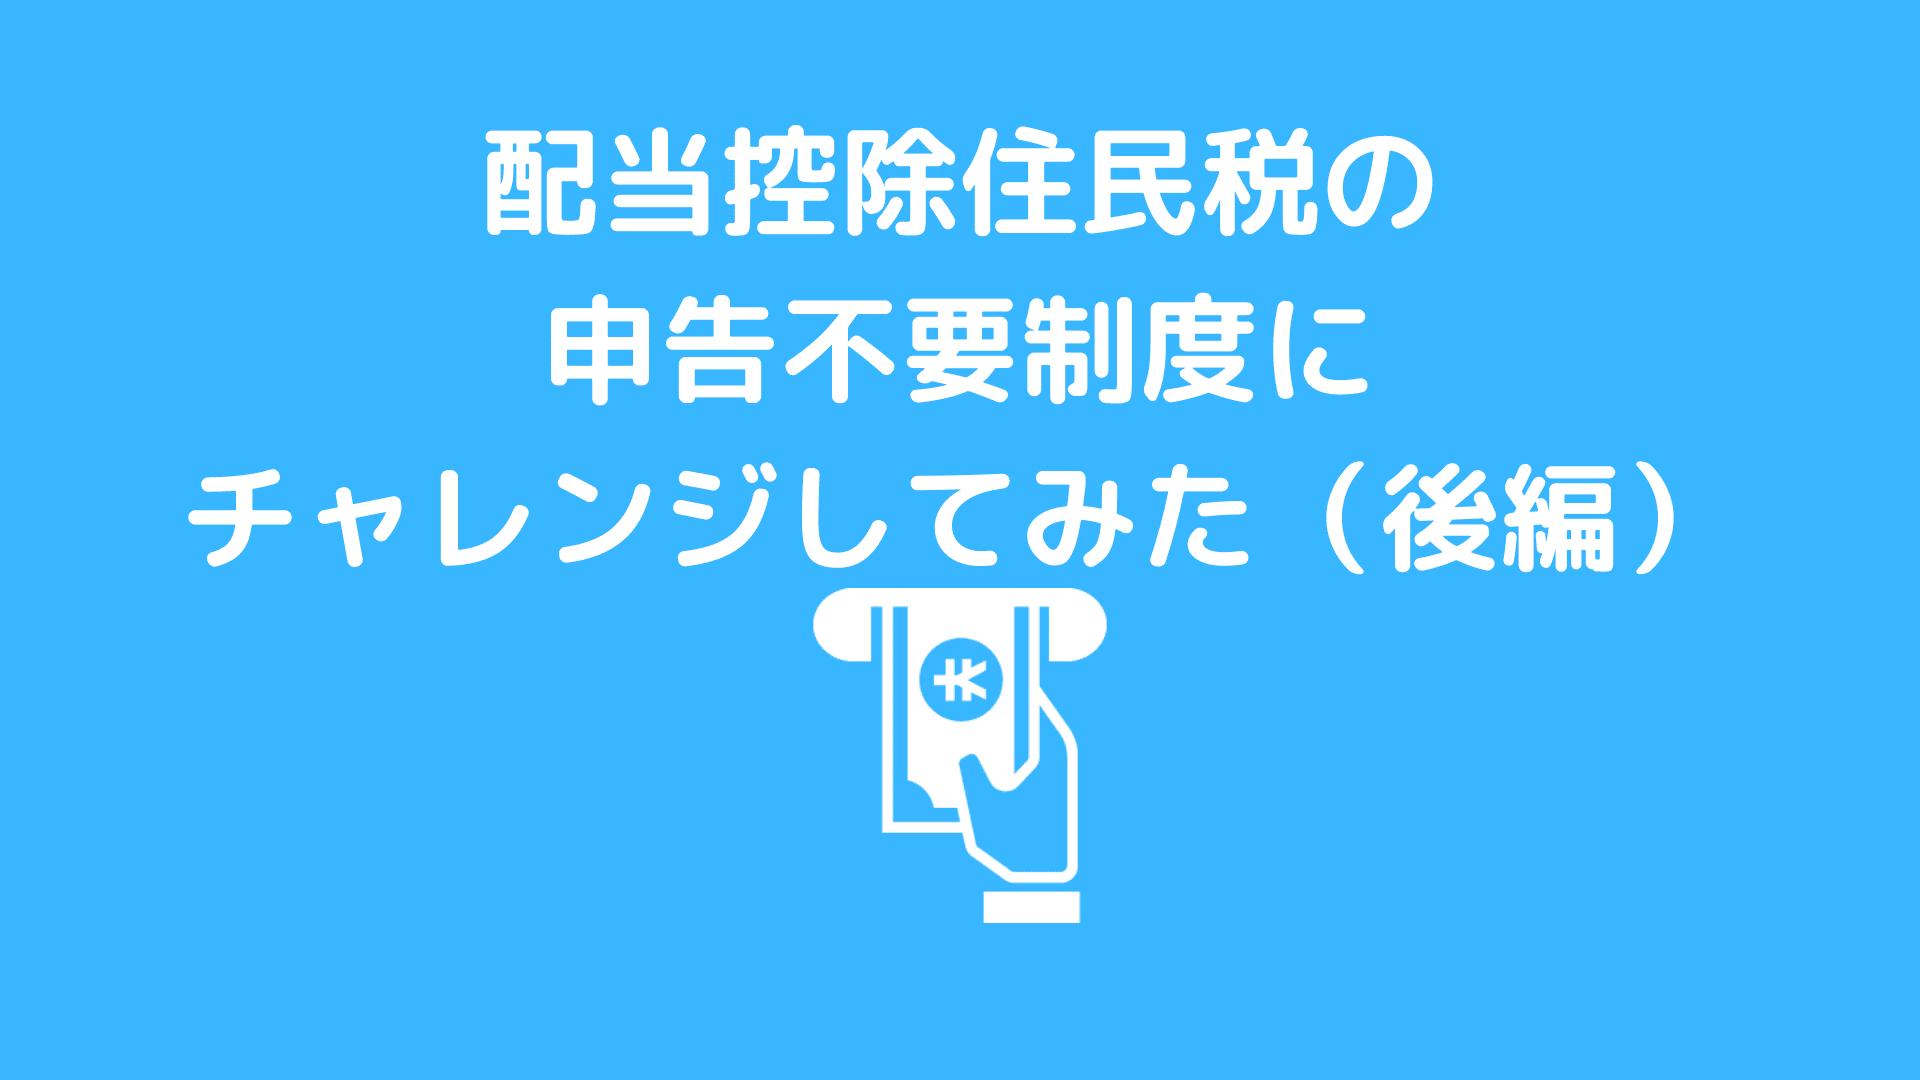 0001 5932354583